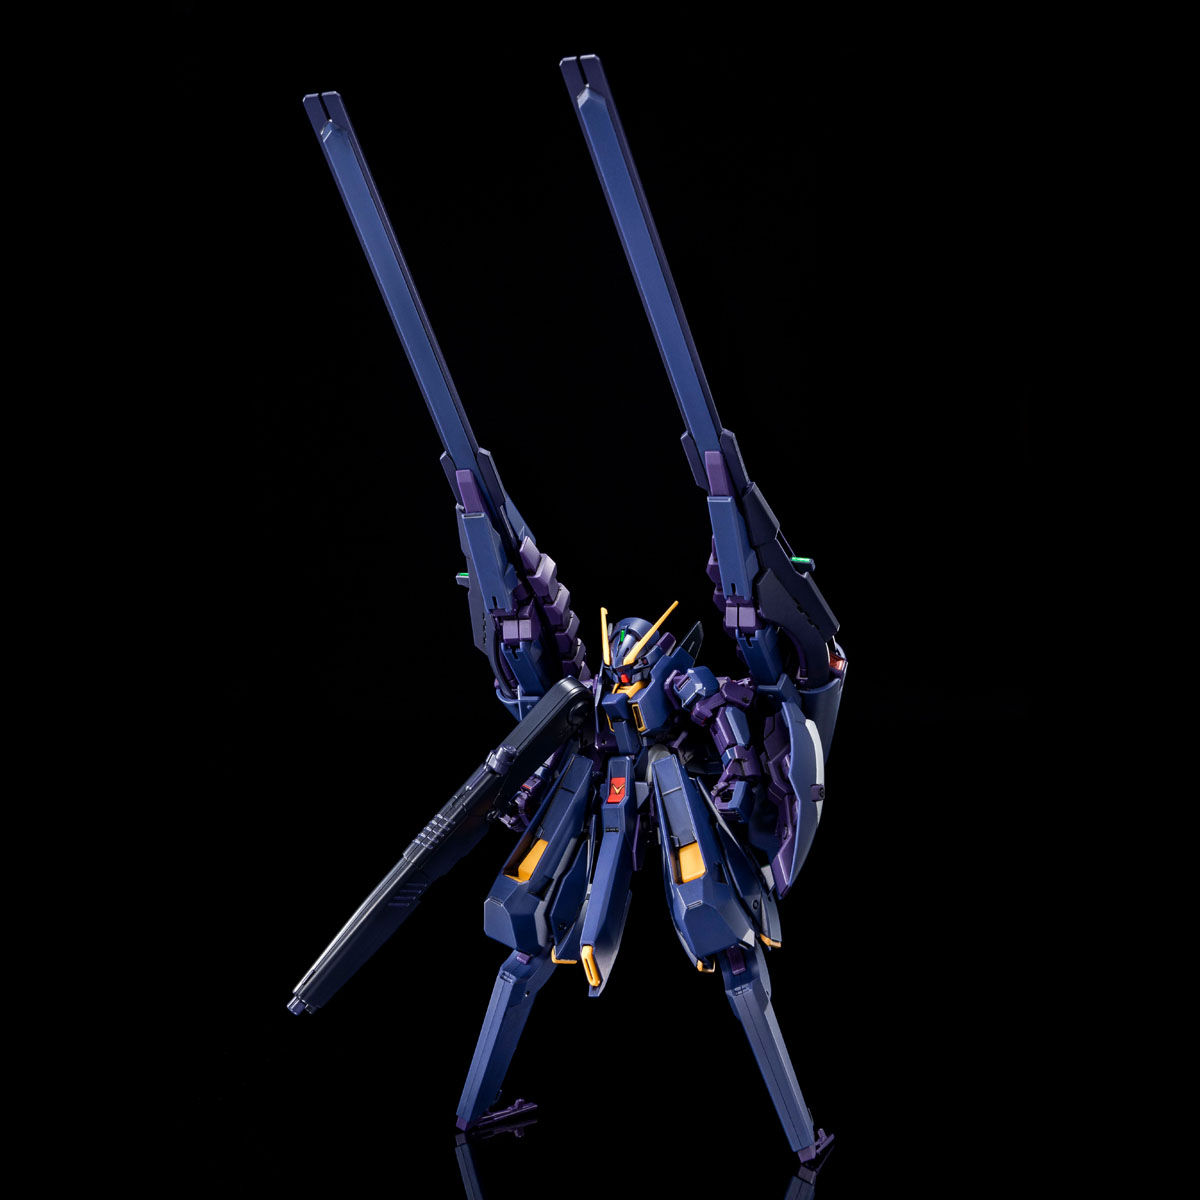 RX-124 ガンダムTR-6〈ヘイズルII〉 [Gundam TR-6 (Hazel II)]